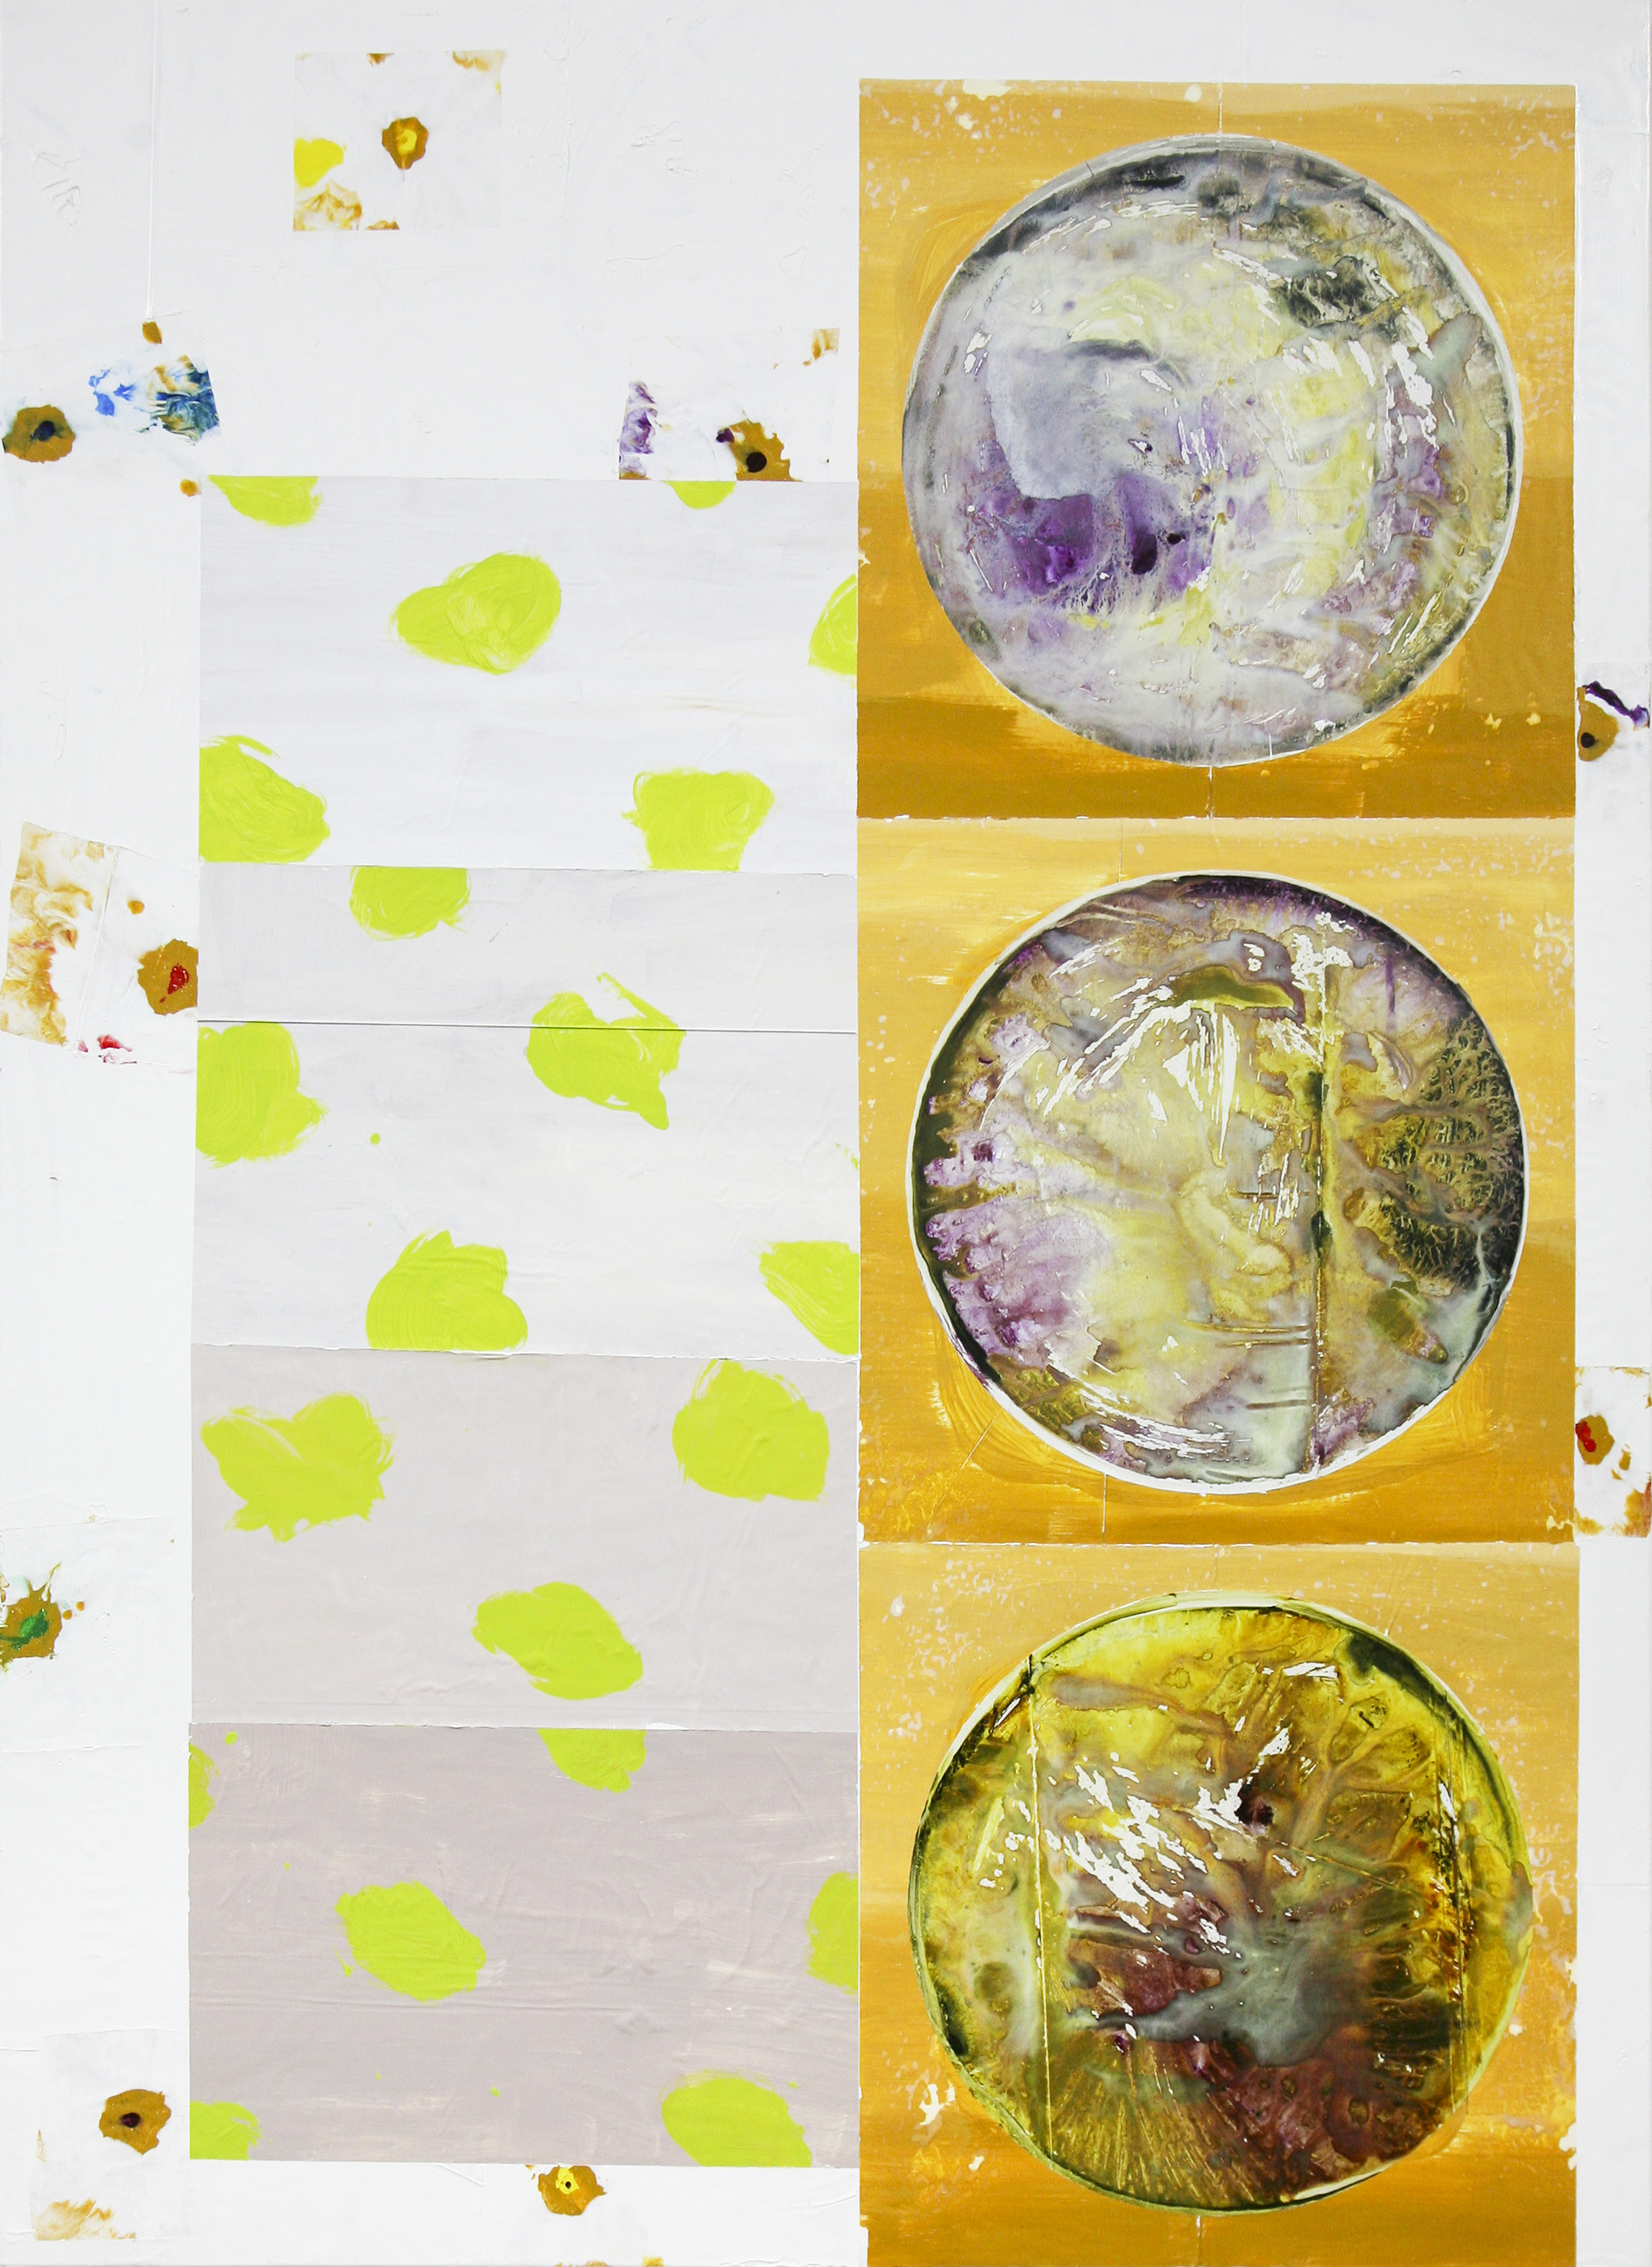 TolbertShane-Untitled-2017-AcrylicOnCanvas-66x48-HR